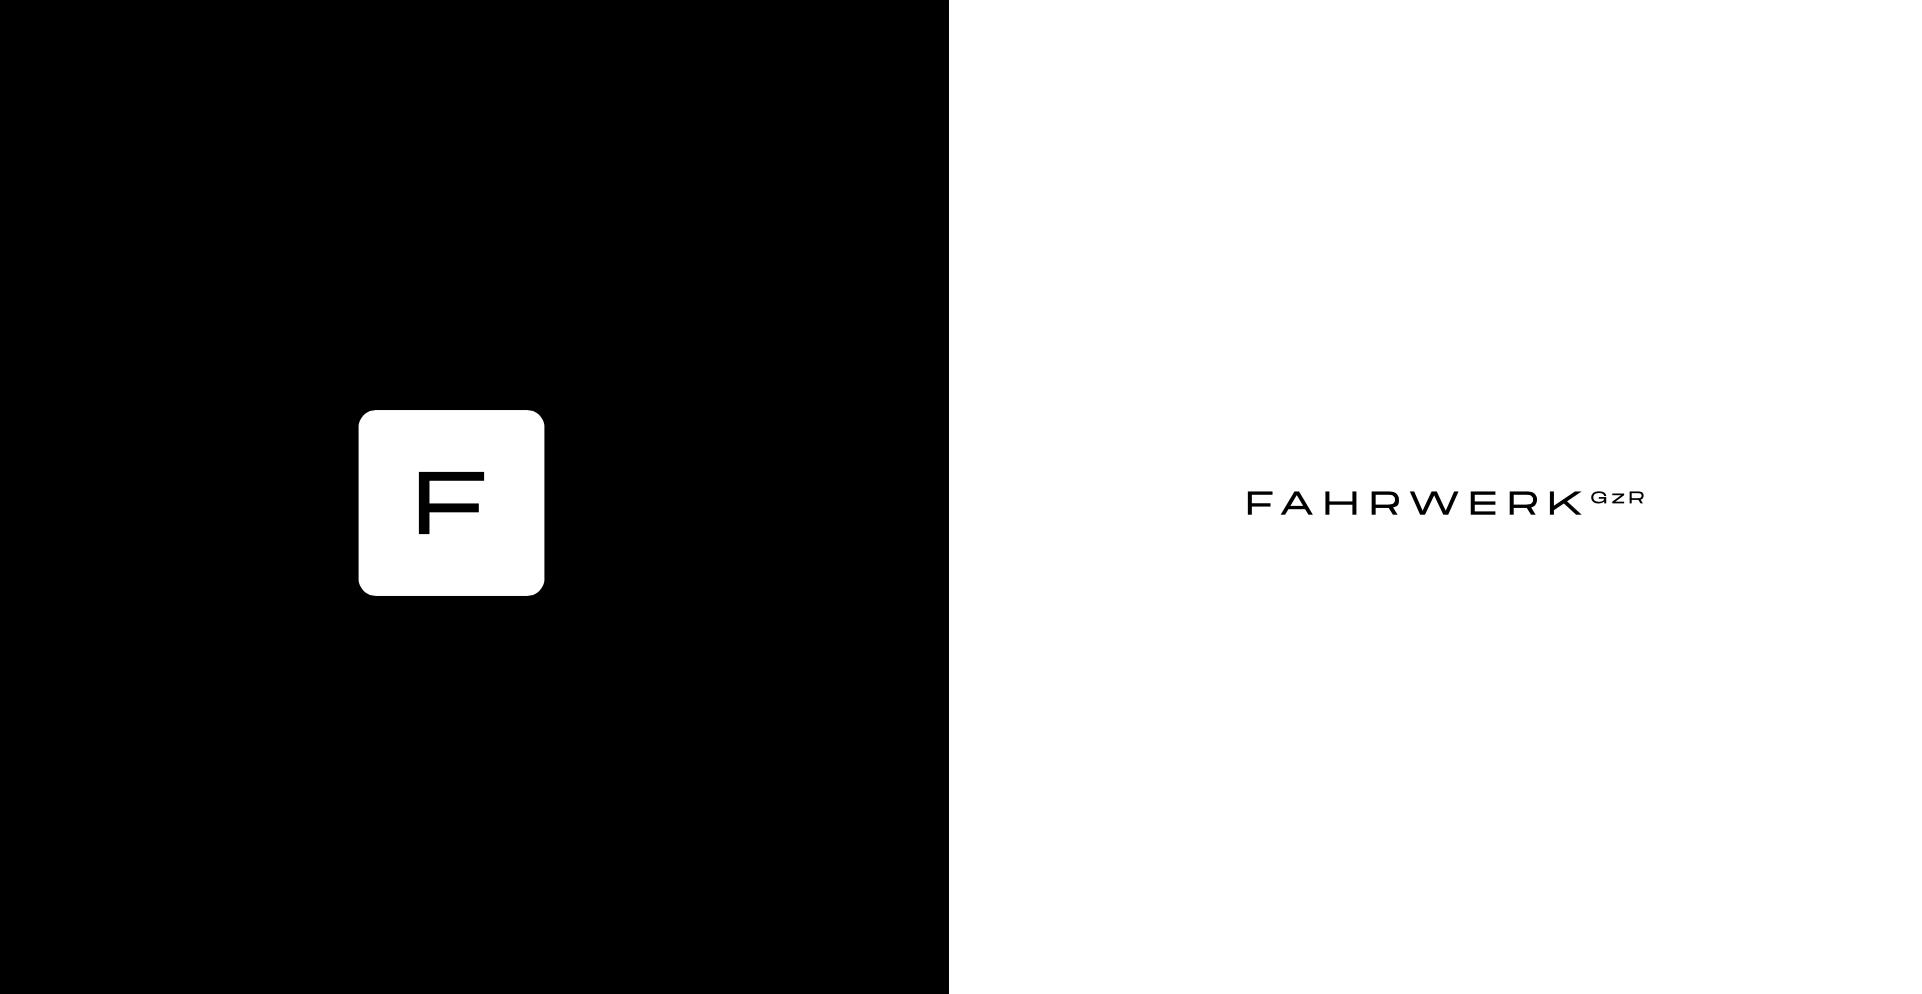 FAHRWERK GzR Logo and CI